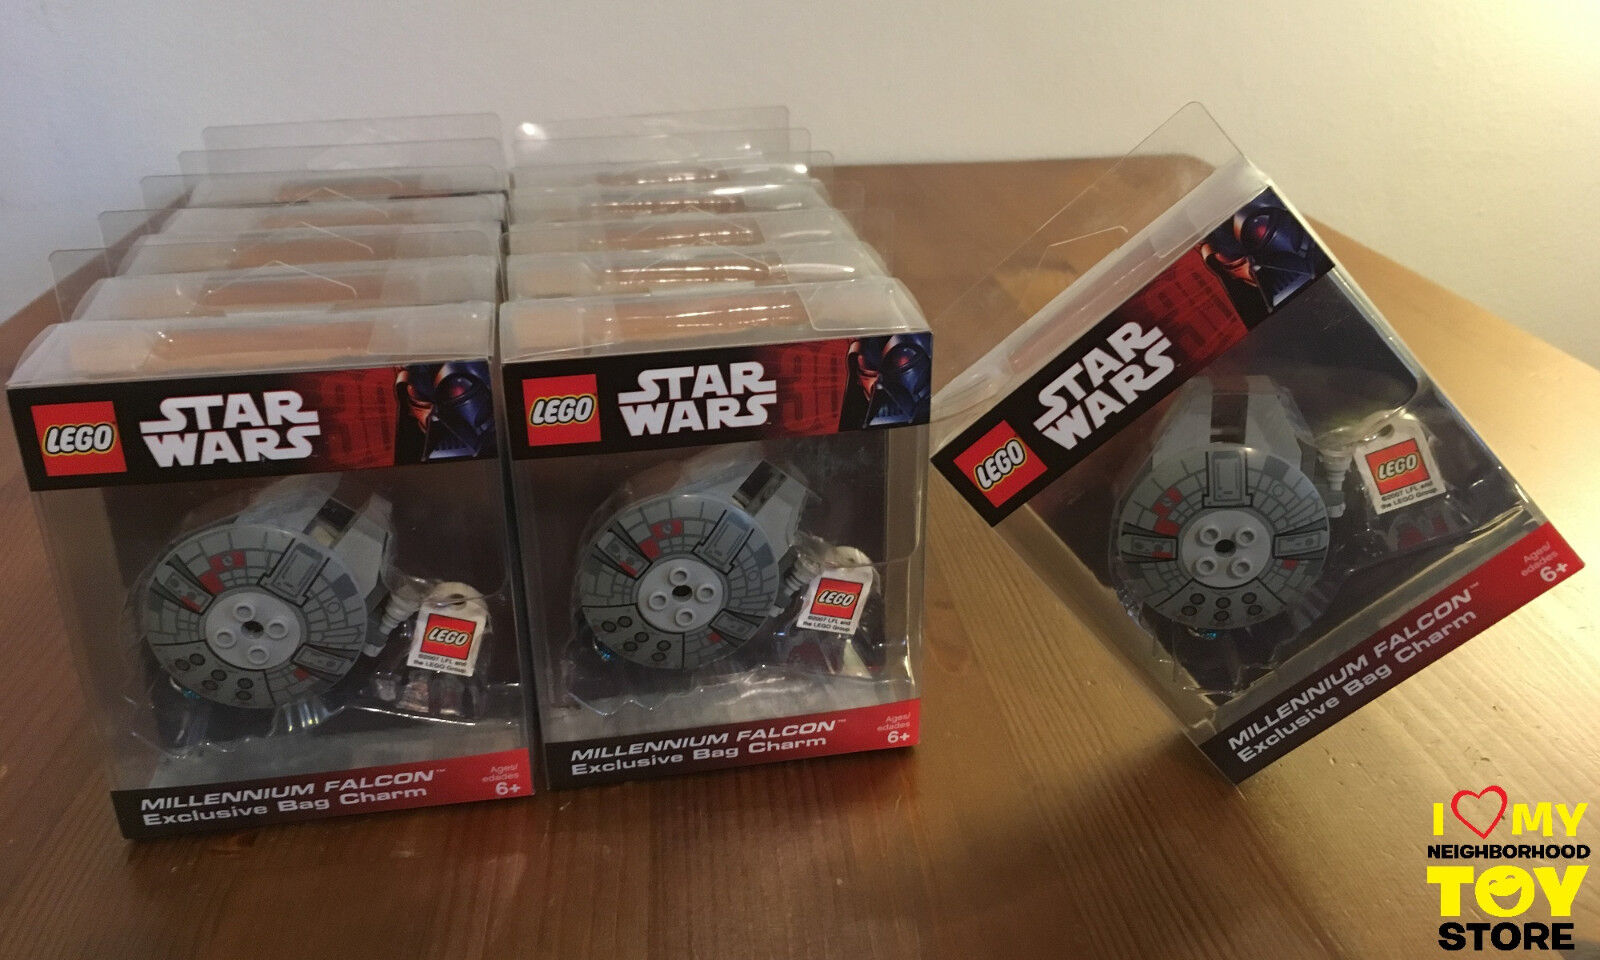 RETIROT - LEGO 852113 4520679 STAR WARS™ MILLENNIUM FALCON™ KEY CHAIN (2007)